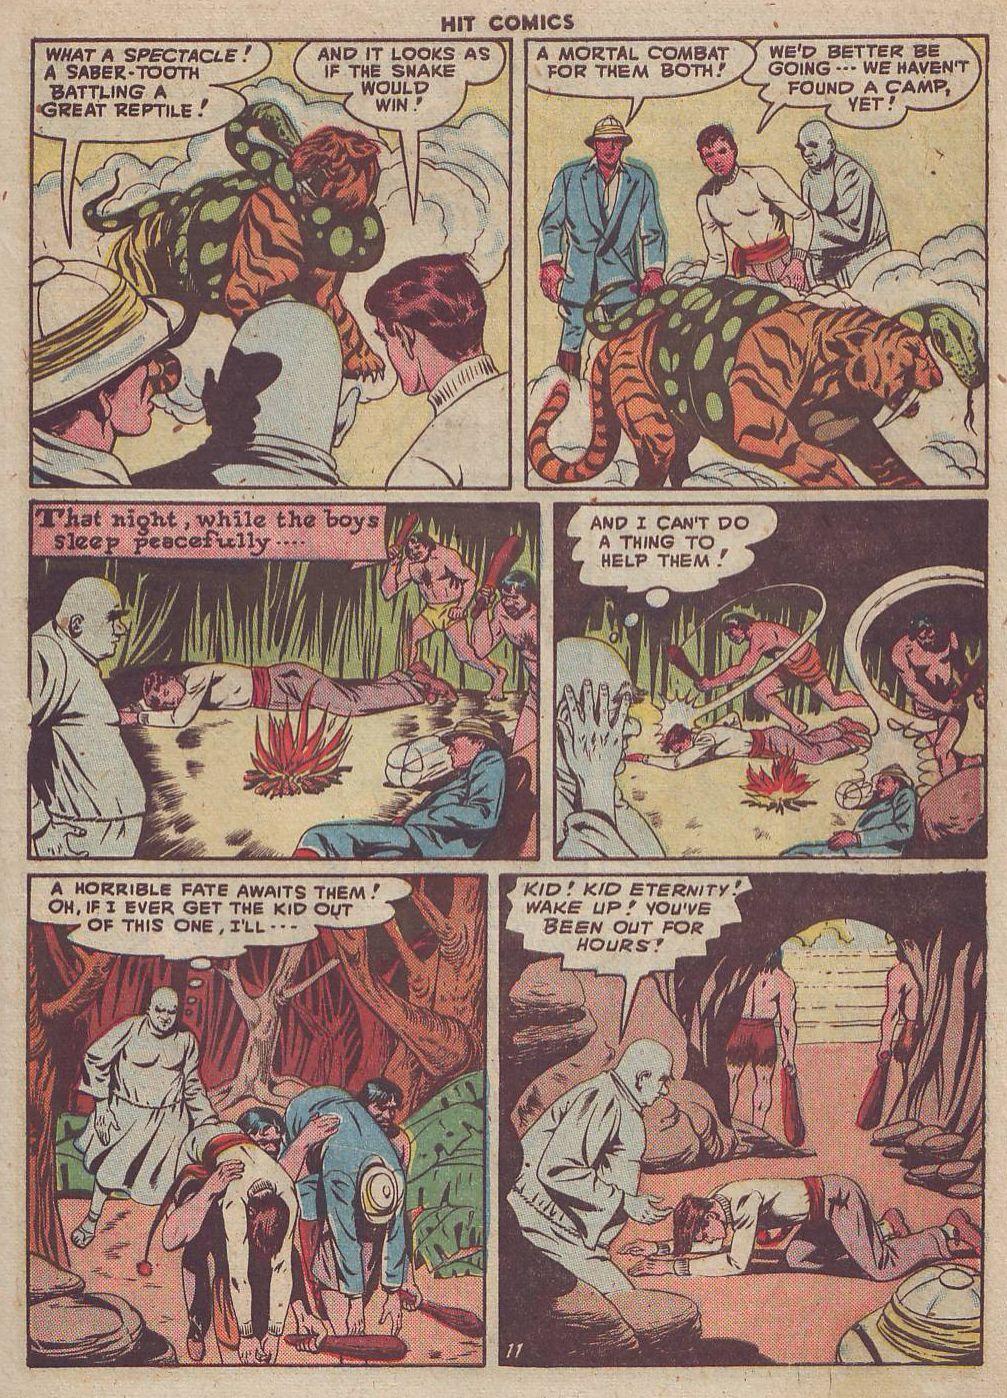 Read online Hit Comics comic -  Issue #51 - 13